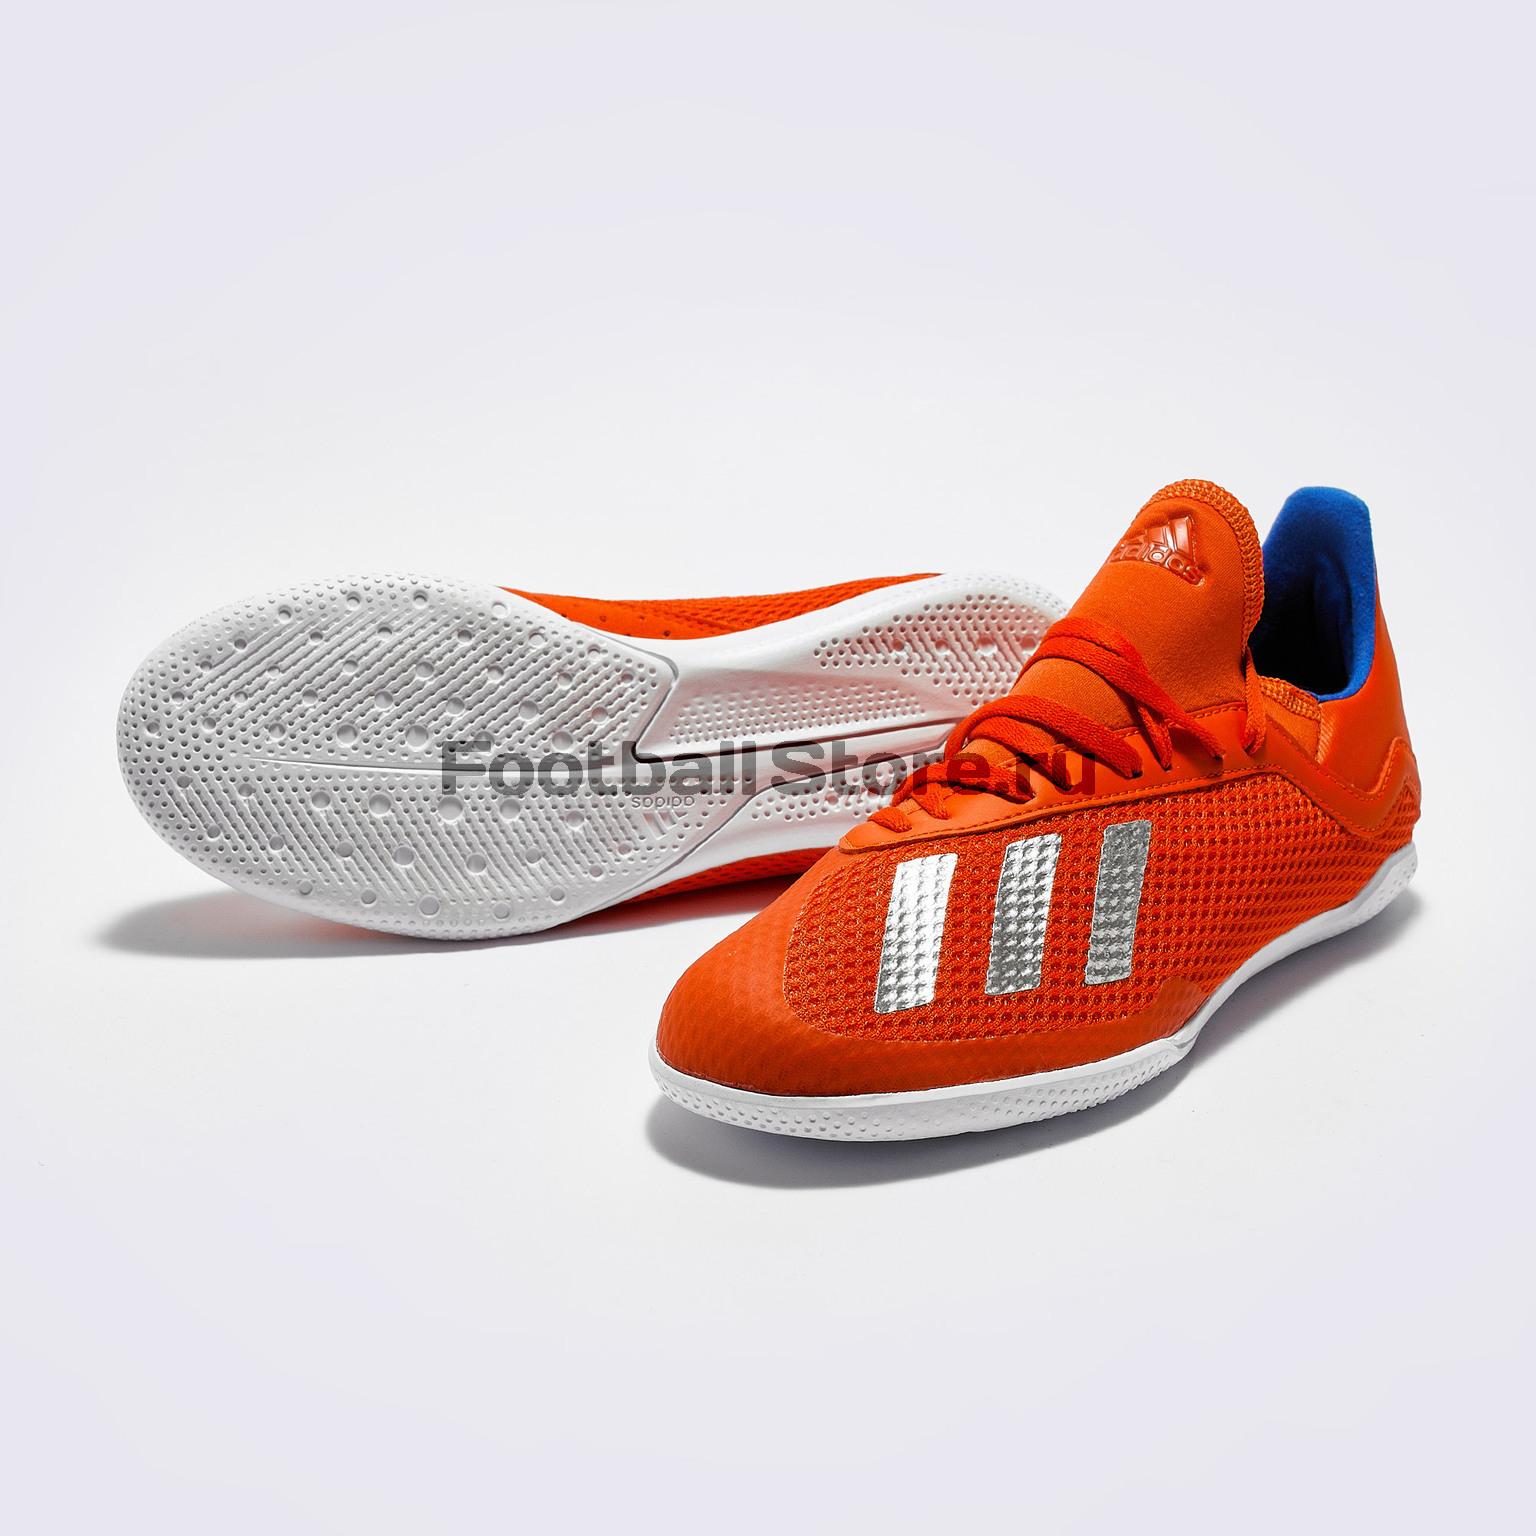 Футзалки детские Adidas X 18.3 IN BB9396